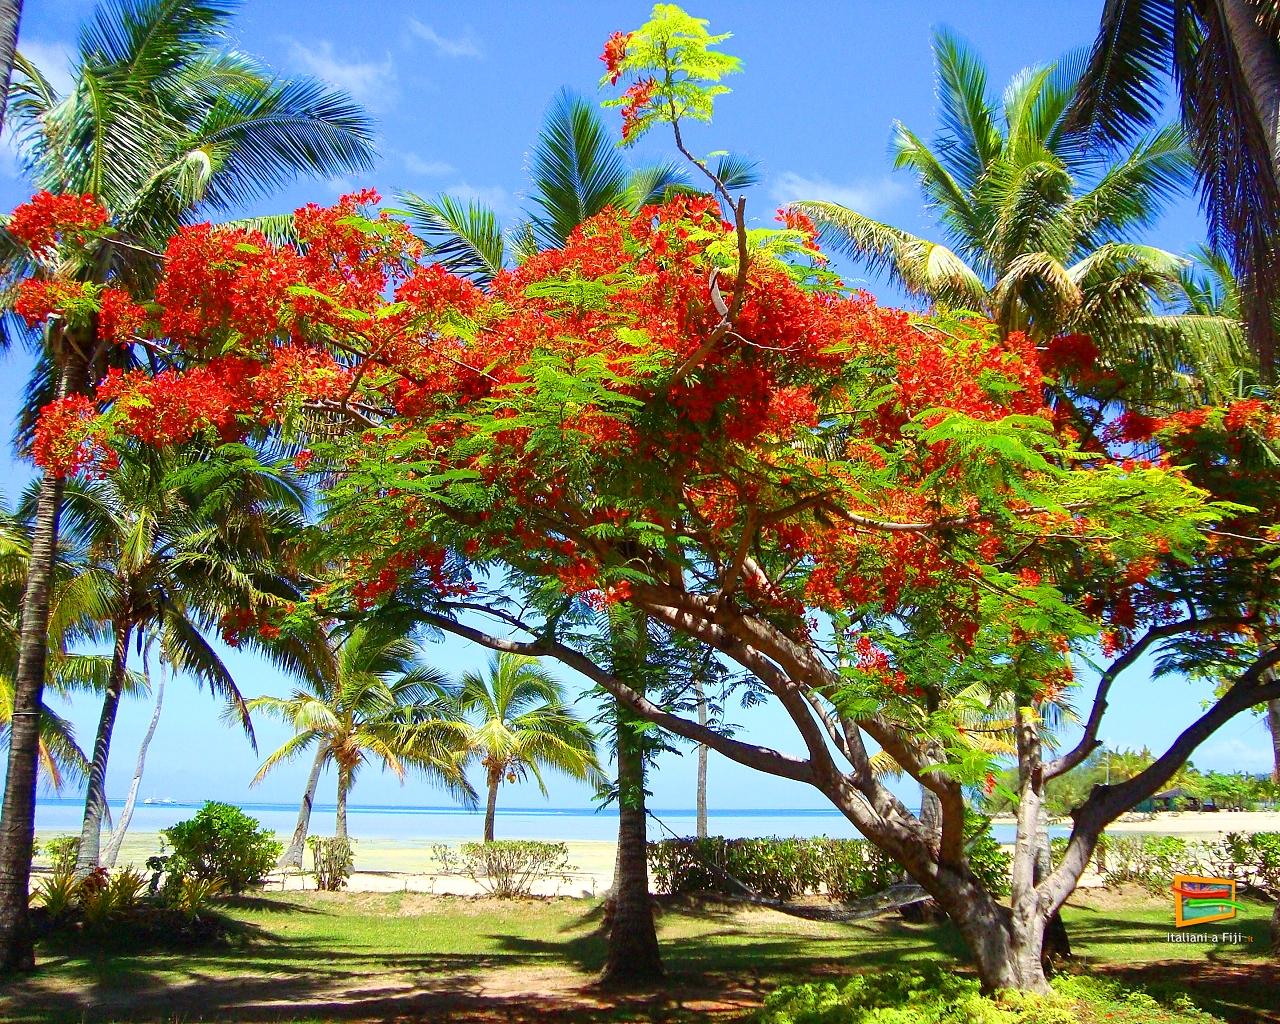 Desktop gratis hd spiaggia e mare paesaggi sfondi for Desktop gratis mare